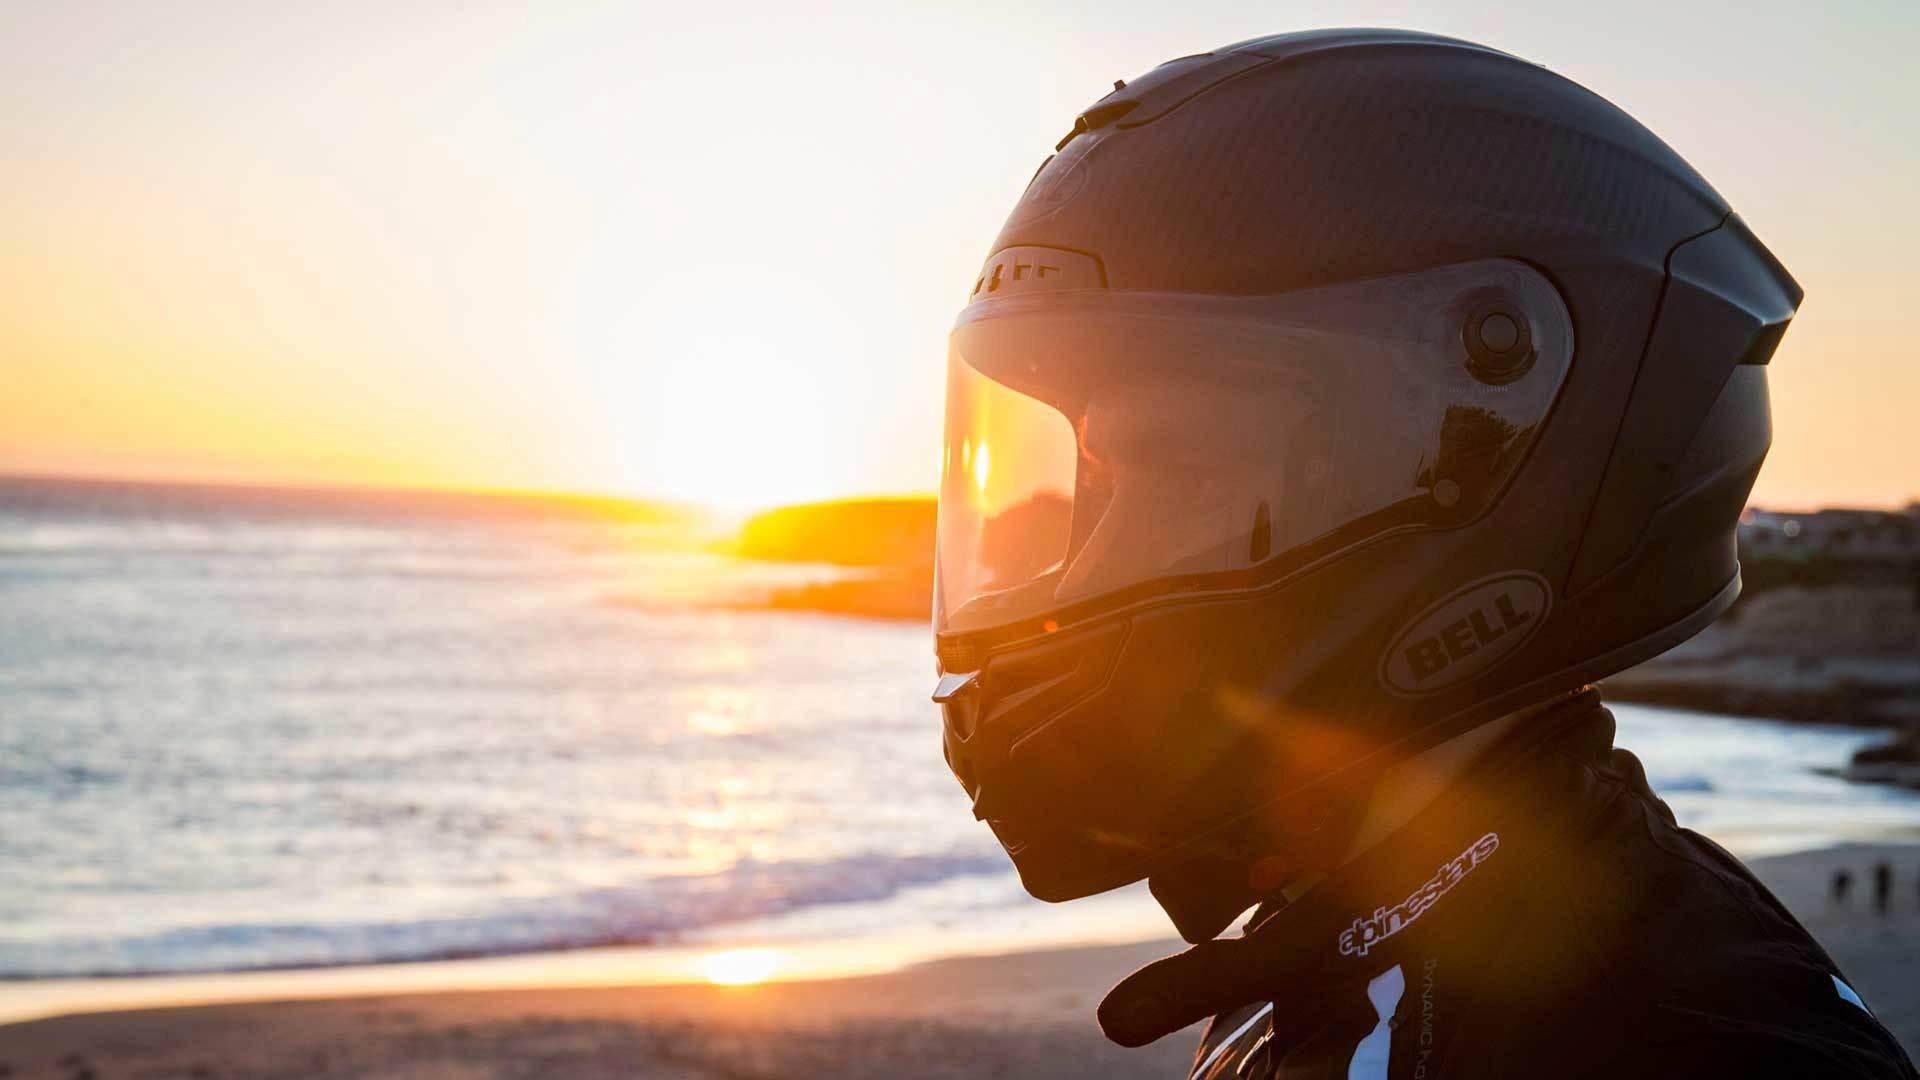 shield Bell Pro Star Light Tint helmet visor